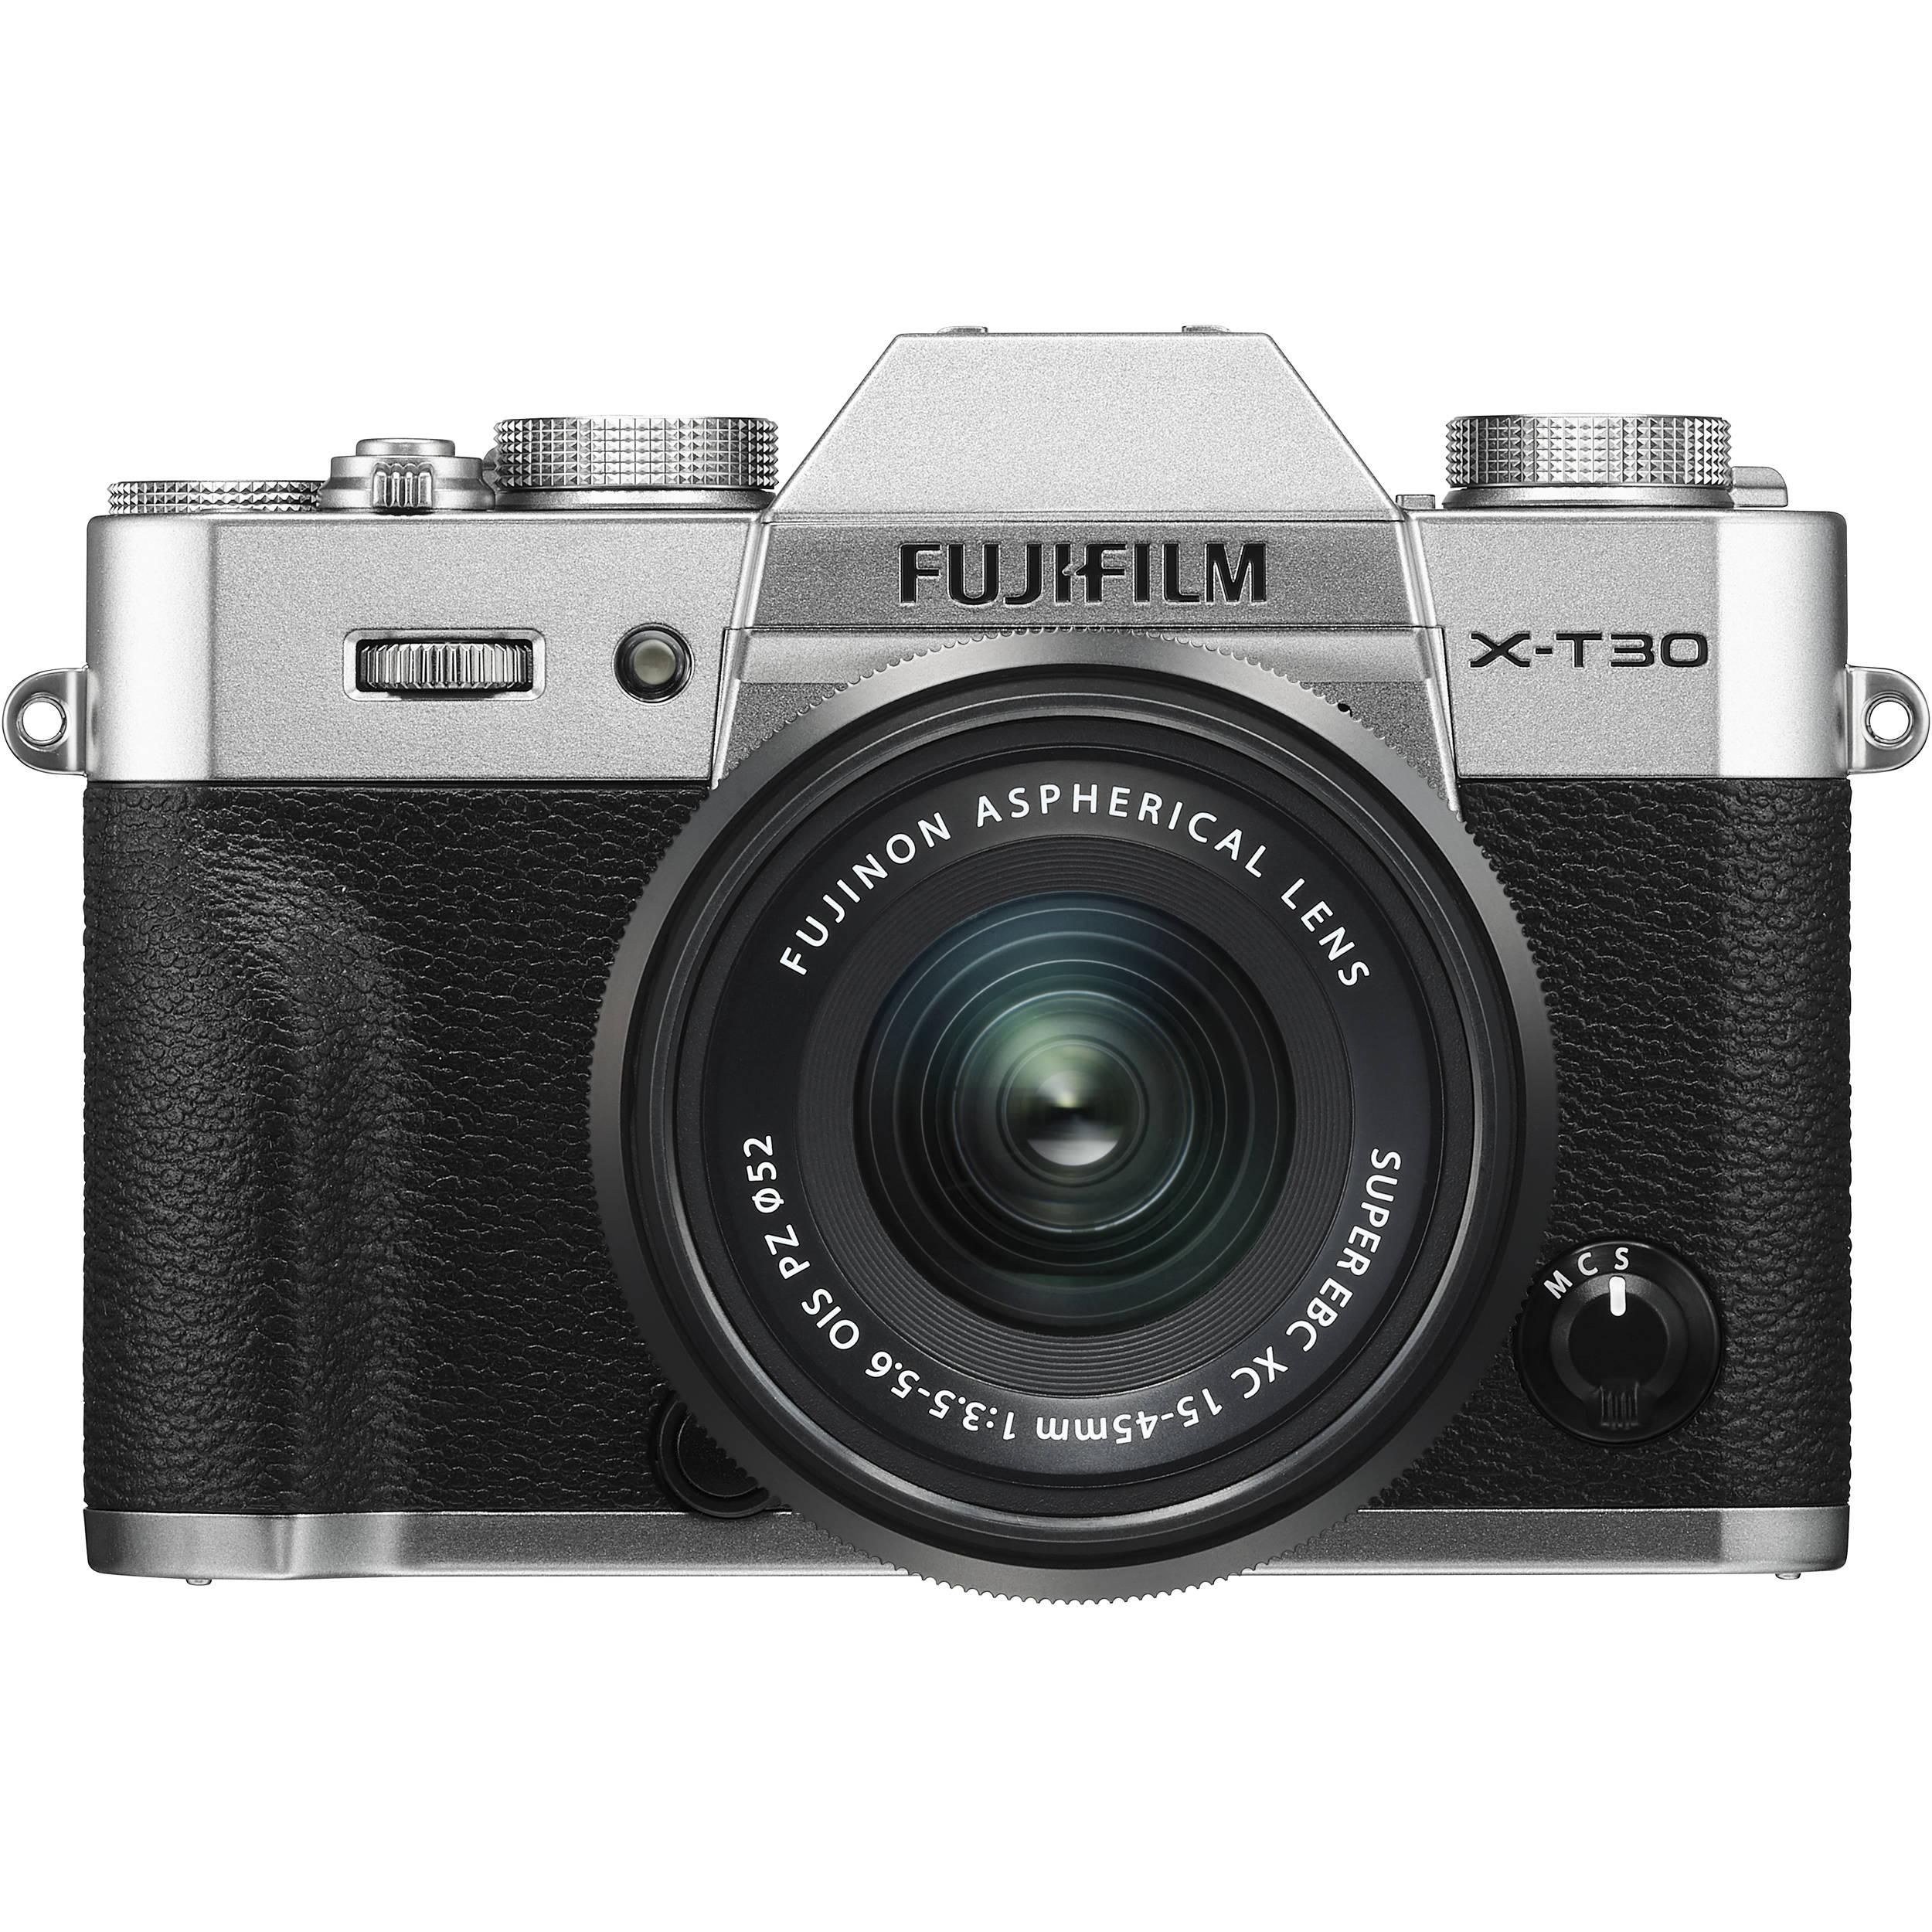 Auflösung Fotogeschäft #075 Fujifilm Instant Camera Piano Black Instax Mini 50s Analoge Fotografie Analogkameras